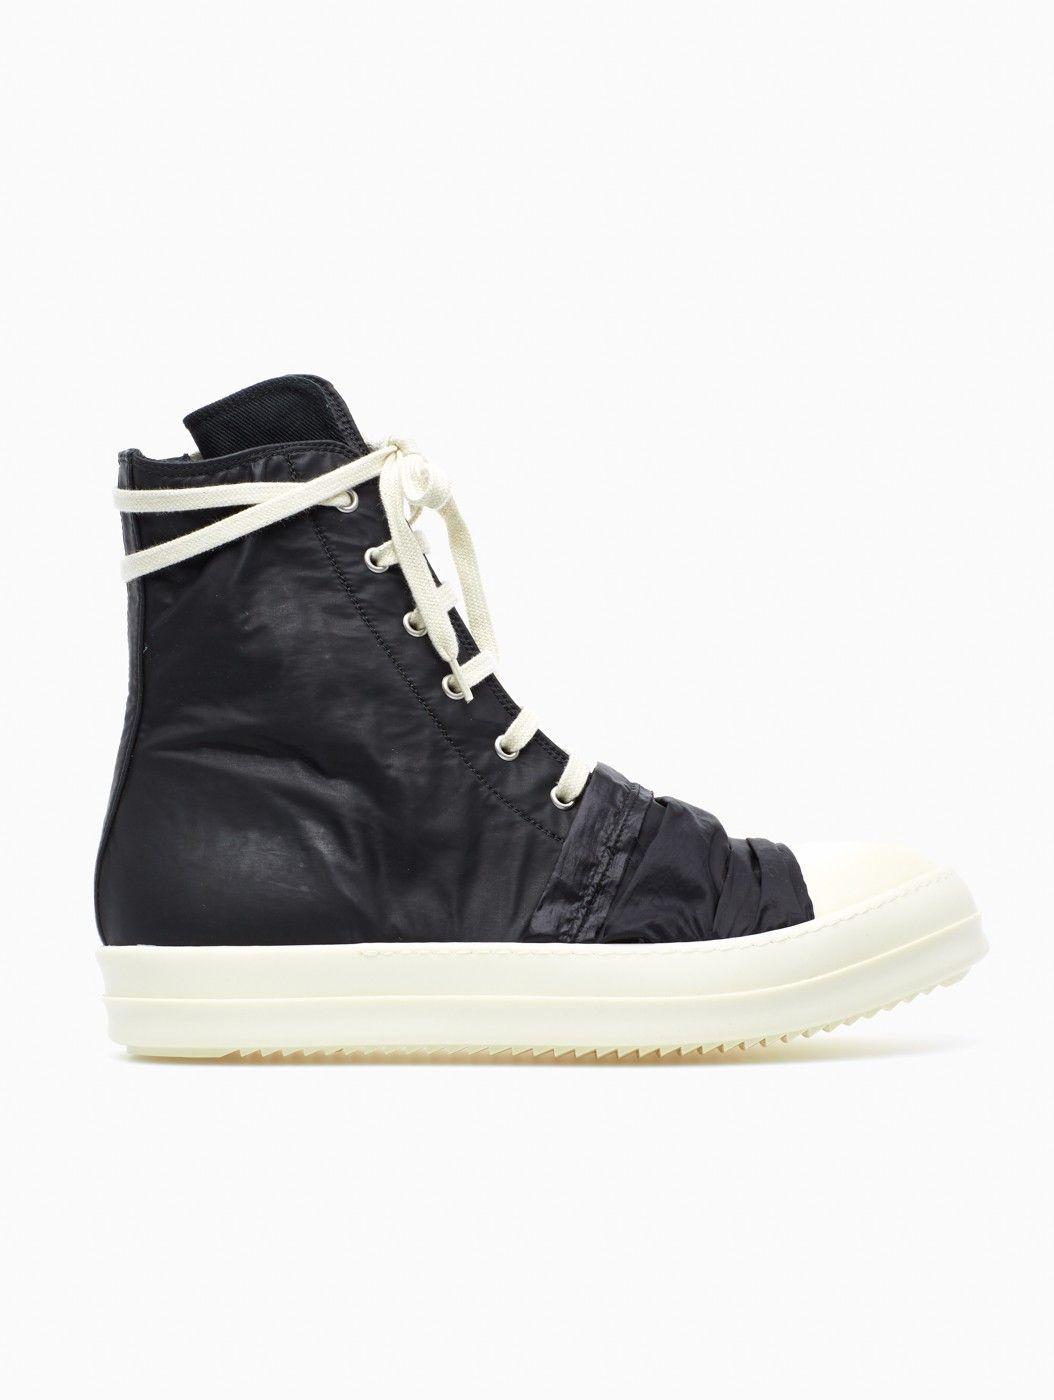 Rick Owens Drkshdw Top Sneakers Hautes - Bleu NobAiv0c